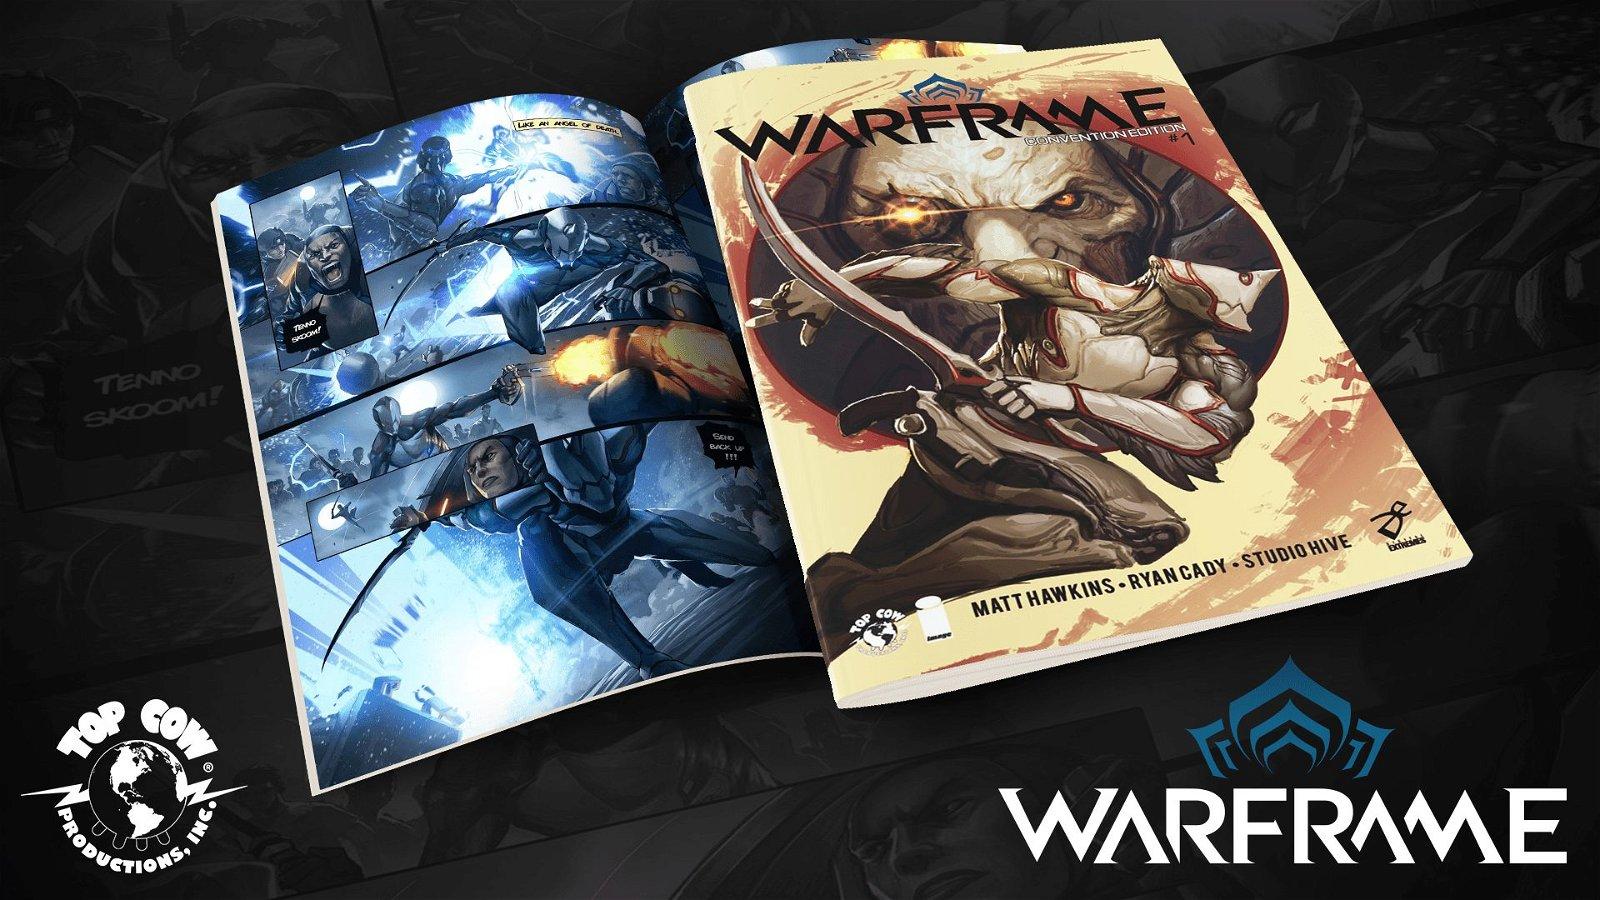 Warframe To Get Original Comic Series Based On The Game 1